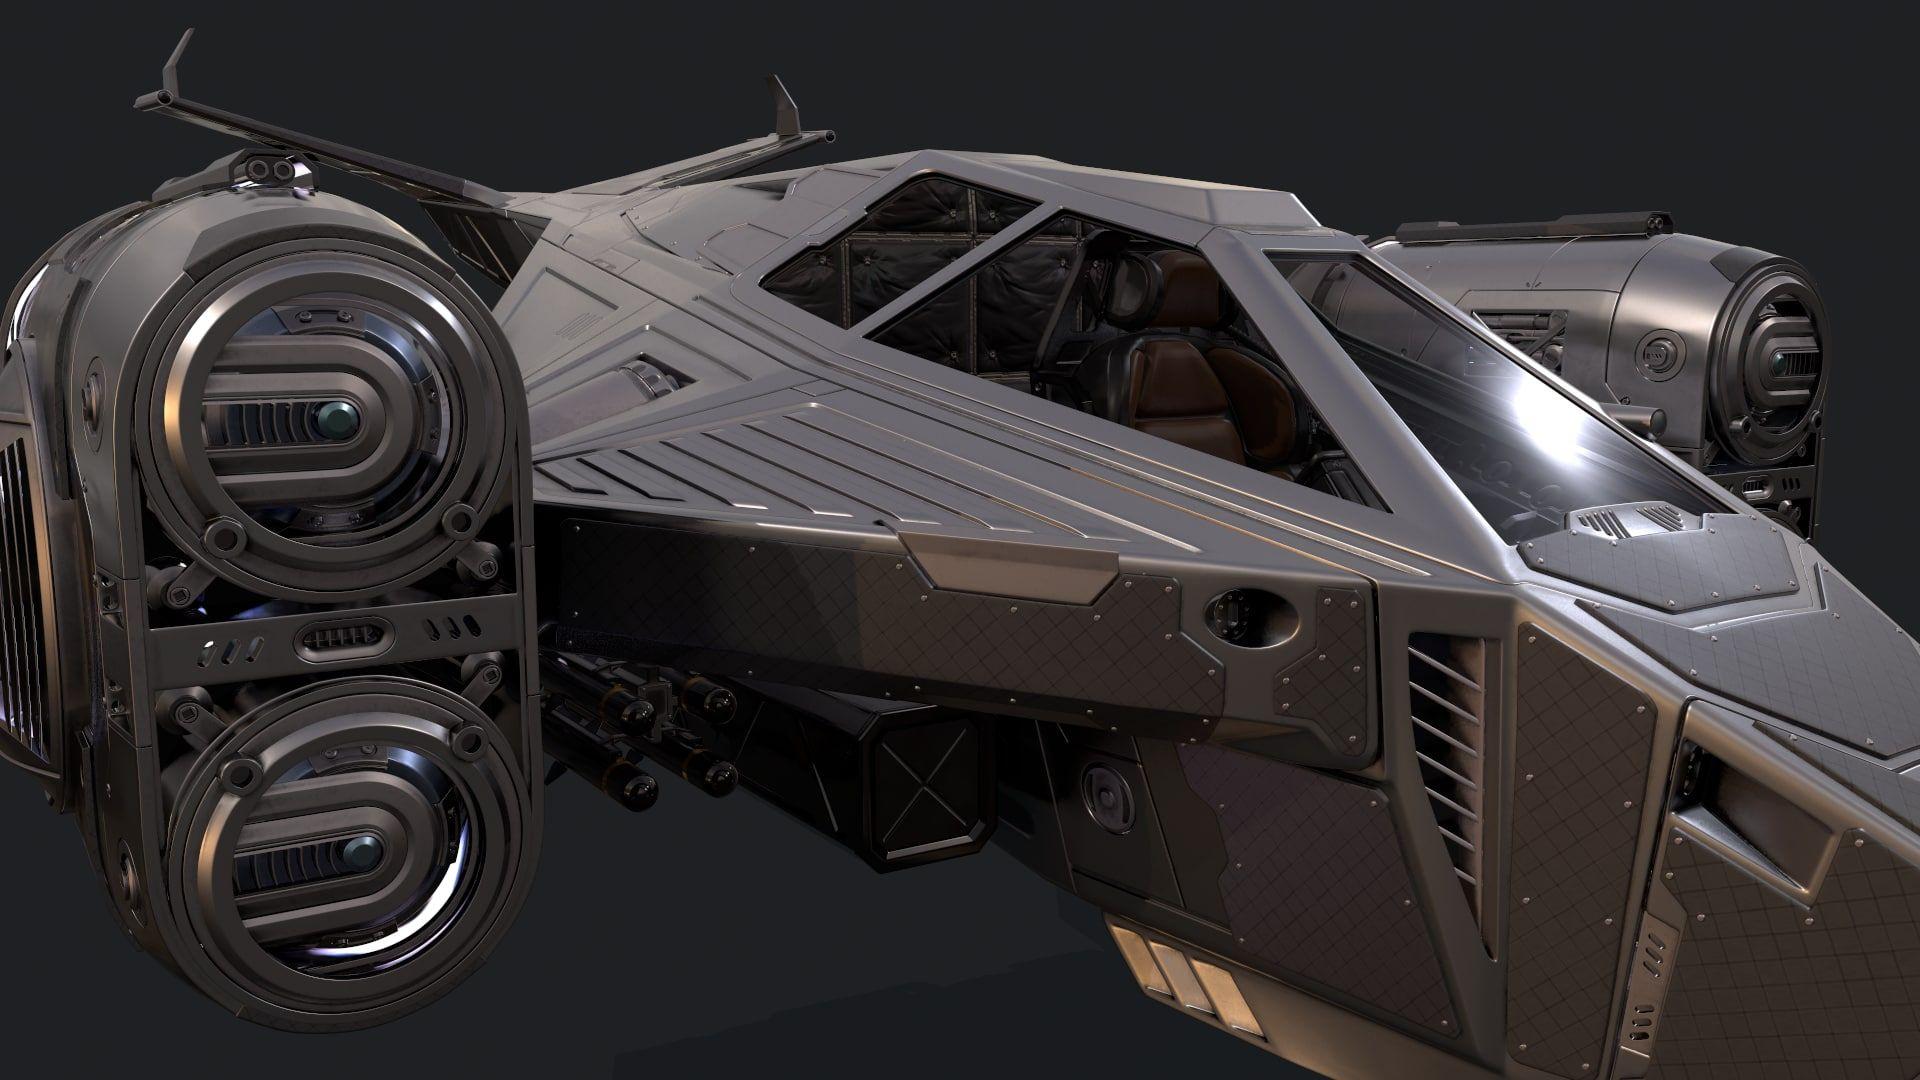 Sci Fi Spaceship 3d Model Spaceship 3d Model 3d Model